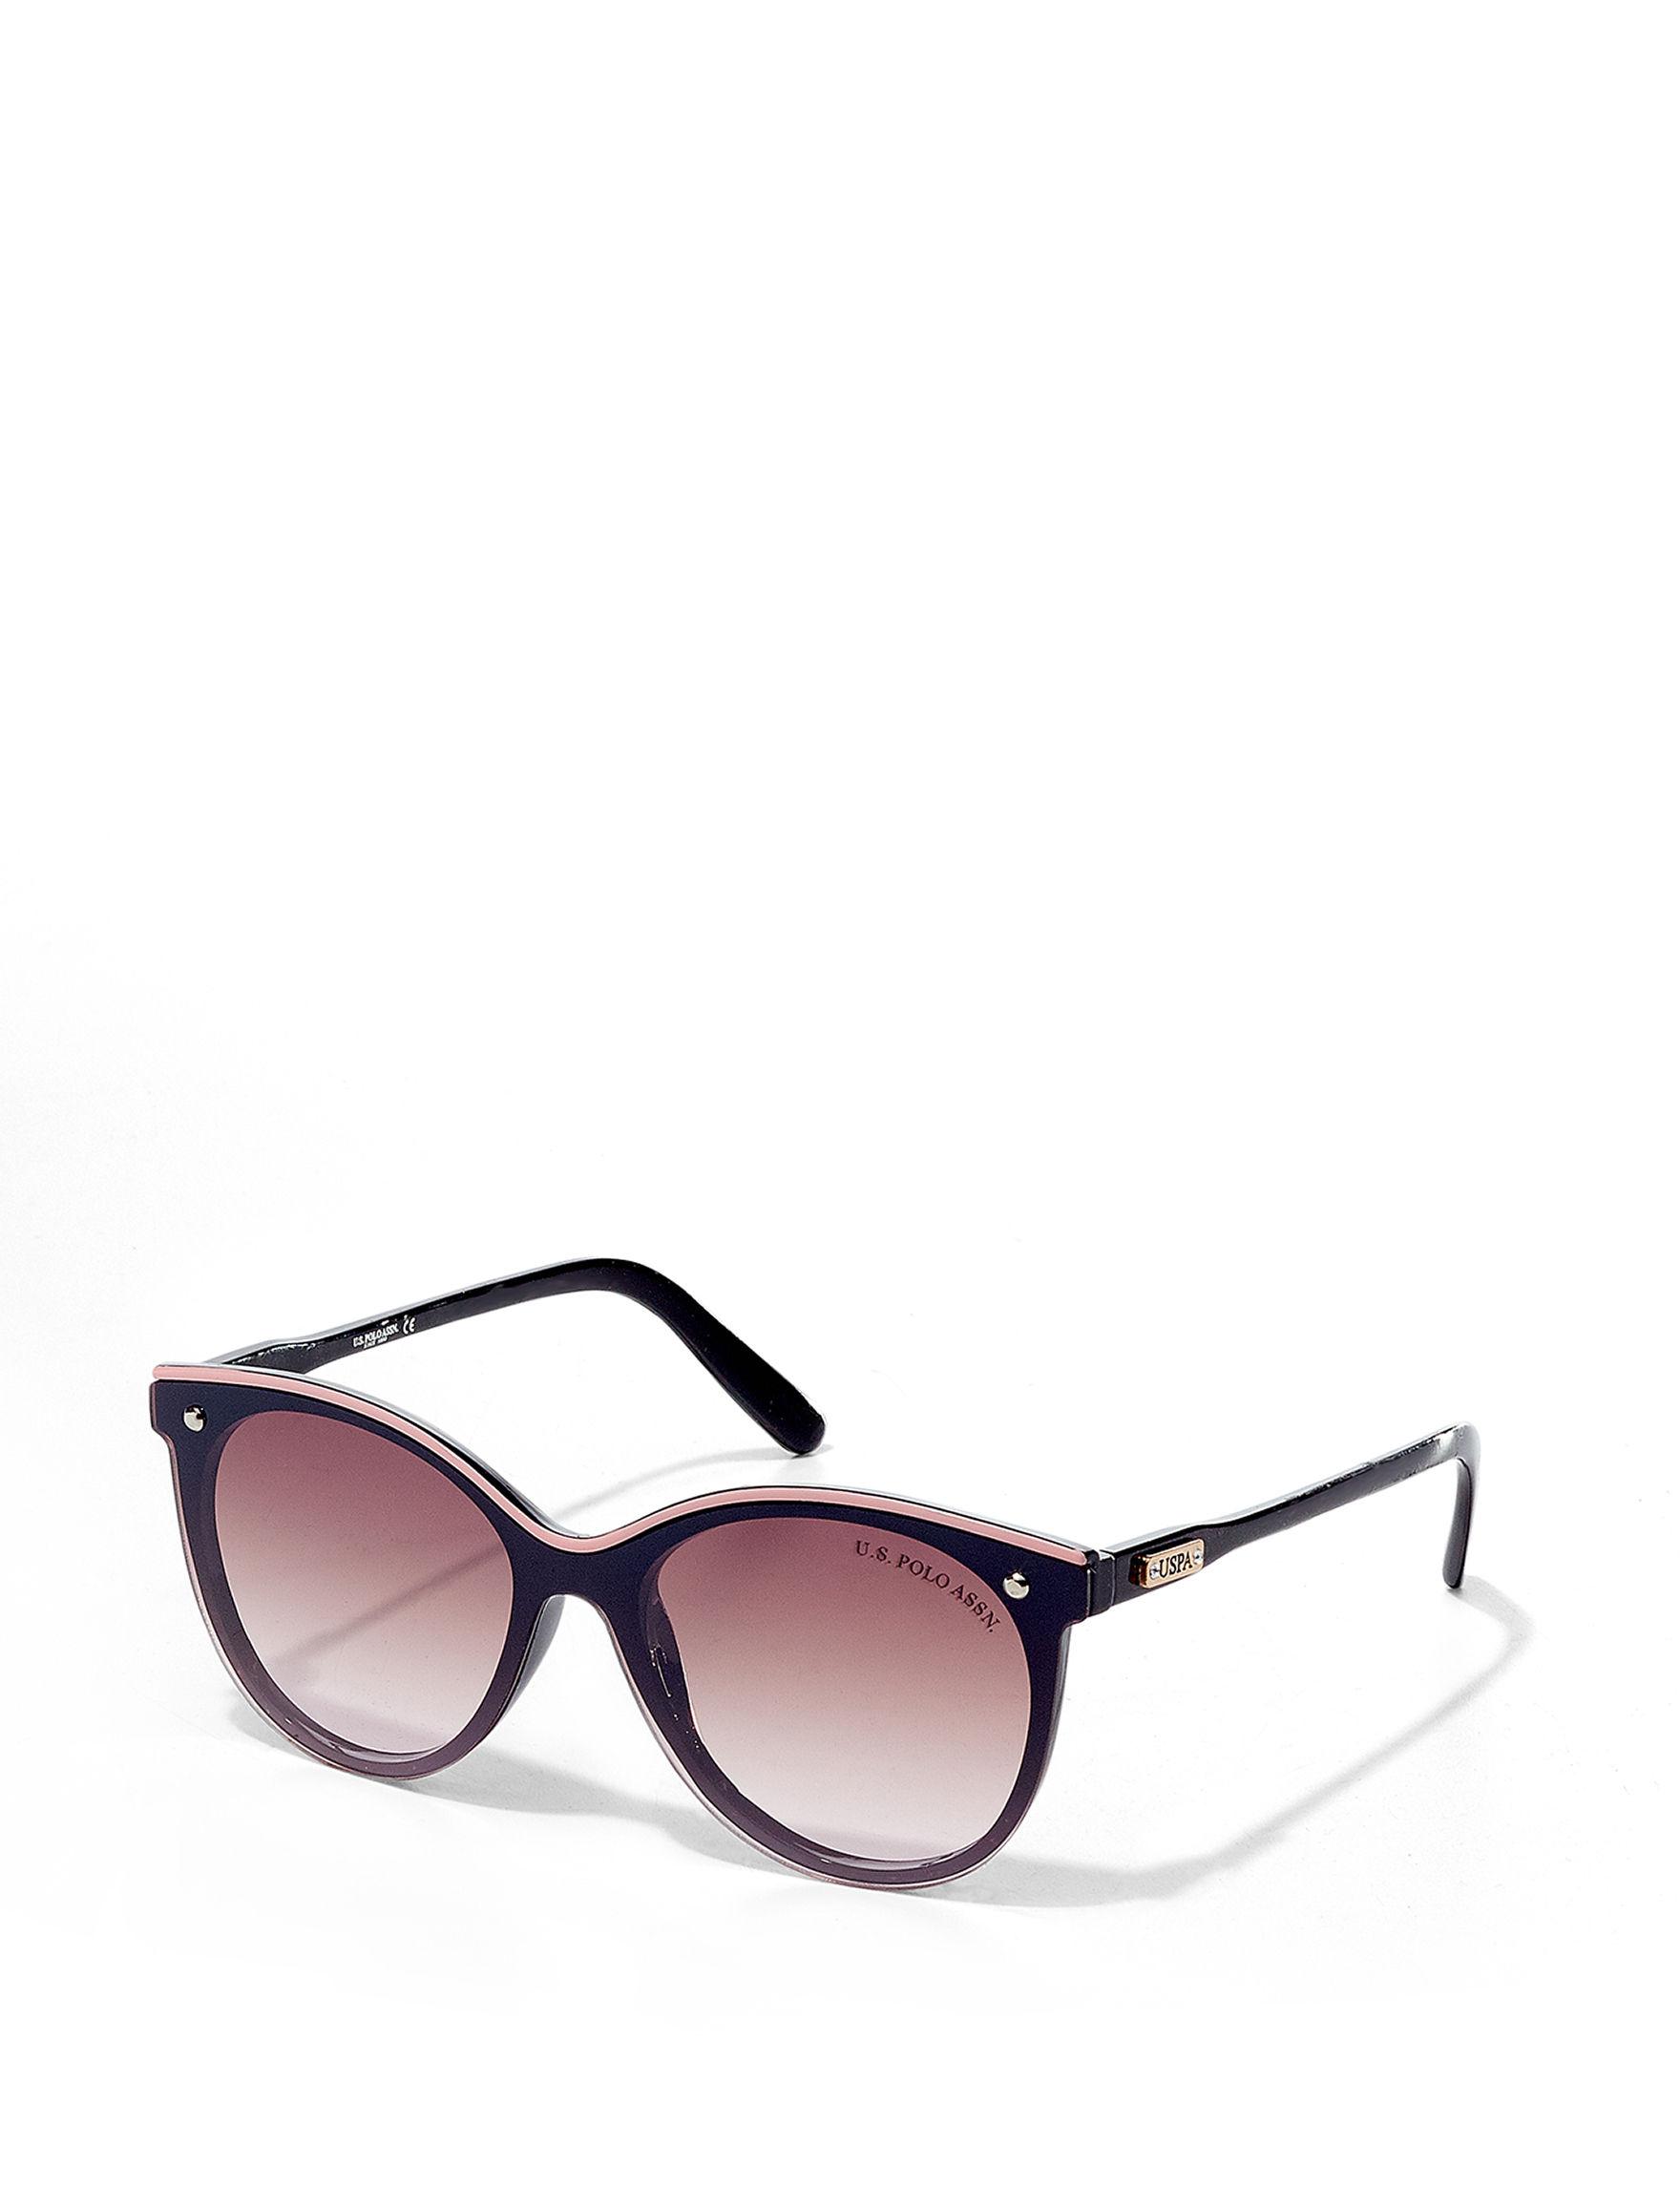 U.S. Polo Assn. Black / Pink Cateye